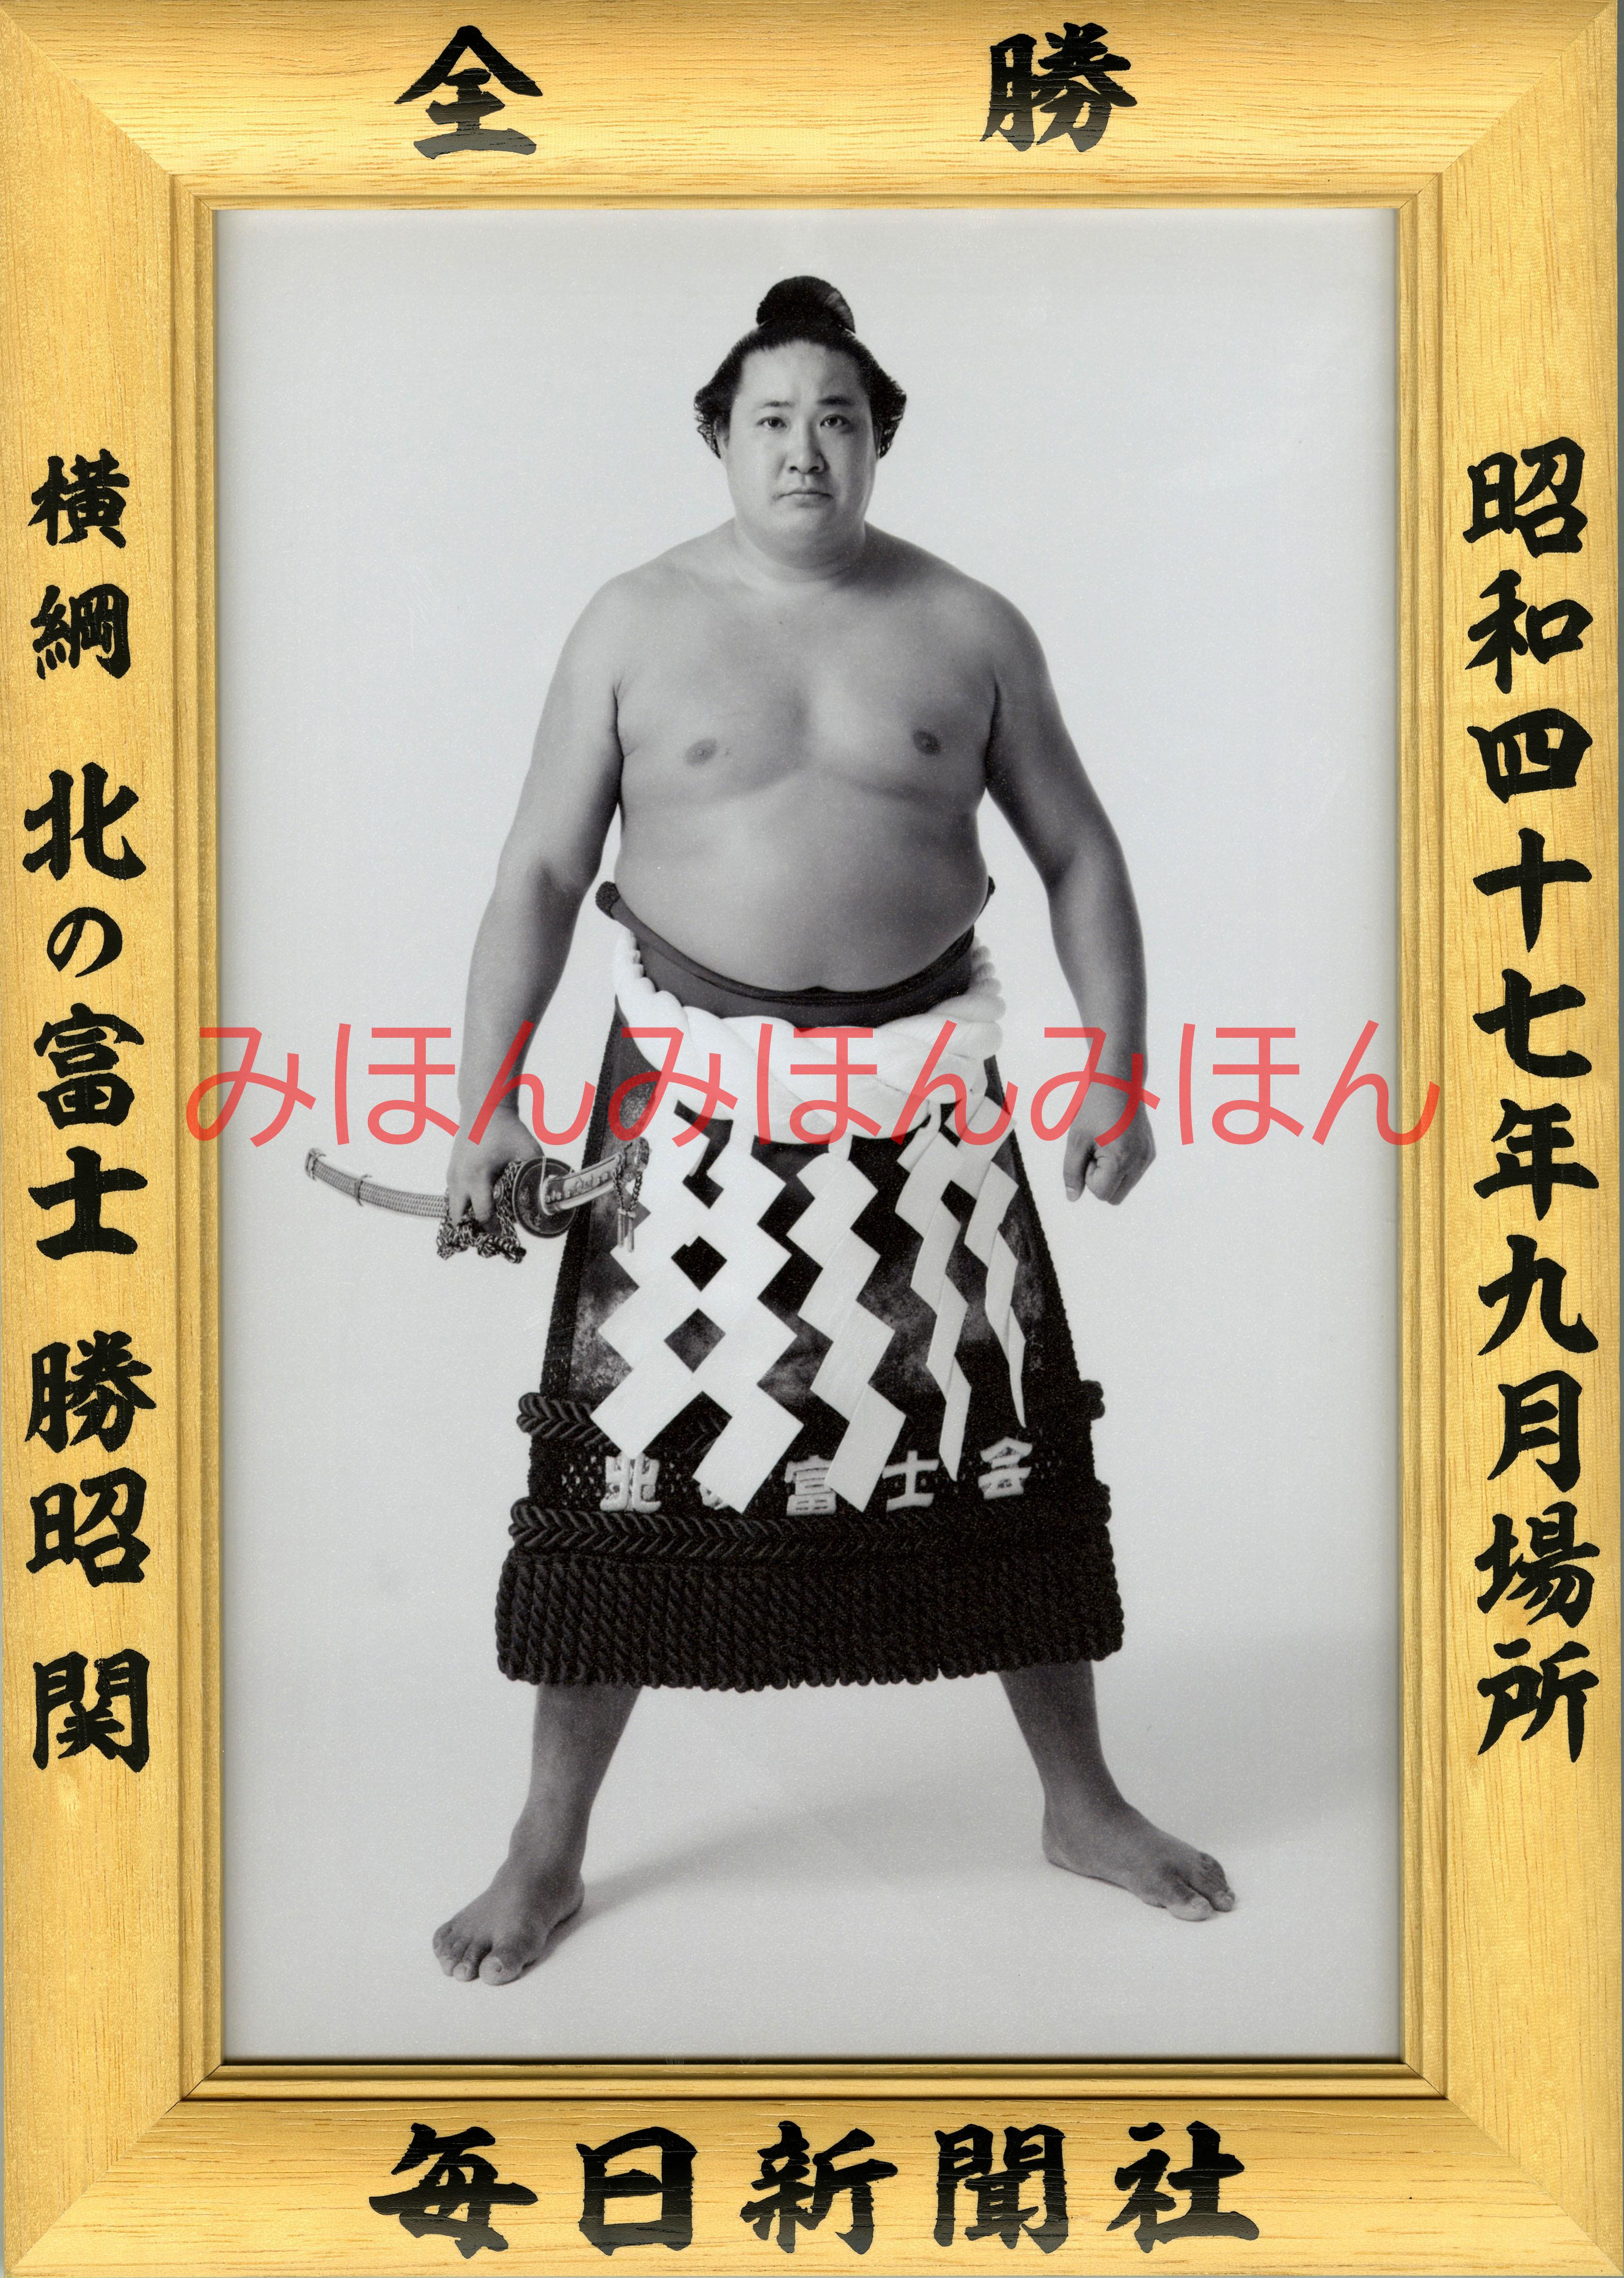 昭和47年9月場所全勝 横綱 北の富士勝昭関(9回目の優勝)